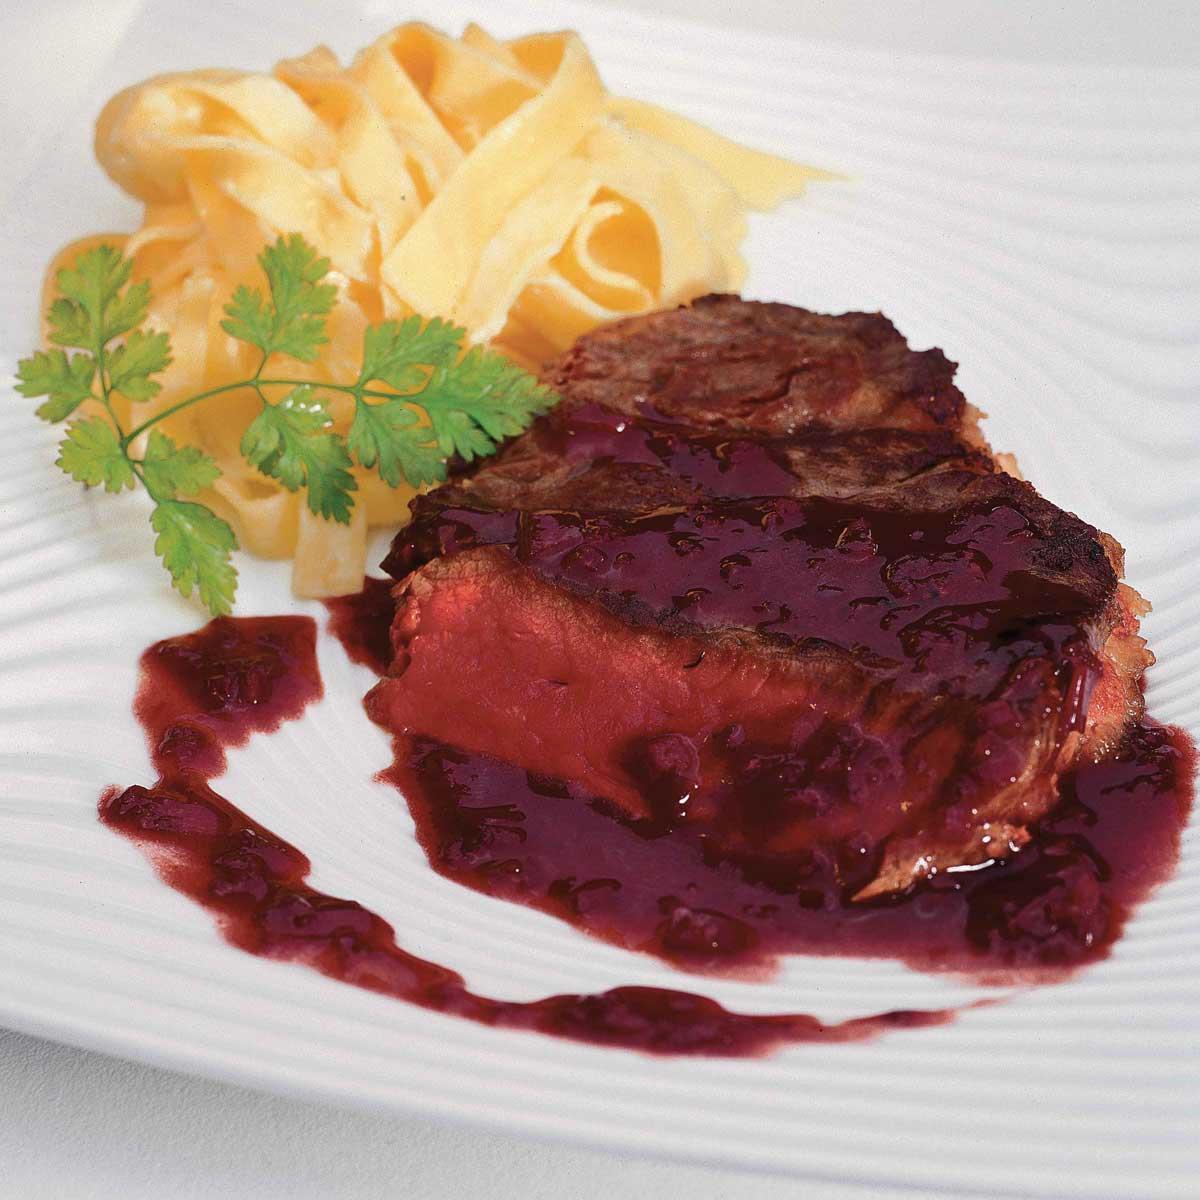 Recette b uf marchand de vin cuisine madame figaro for Marchand cuisine